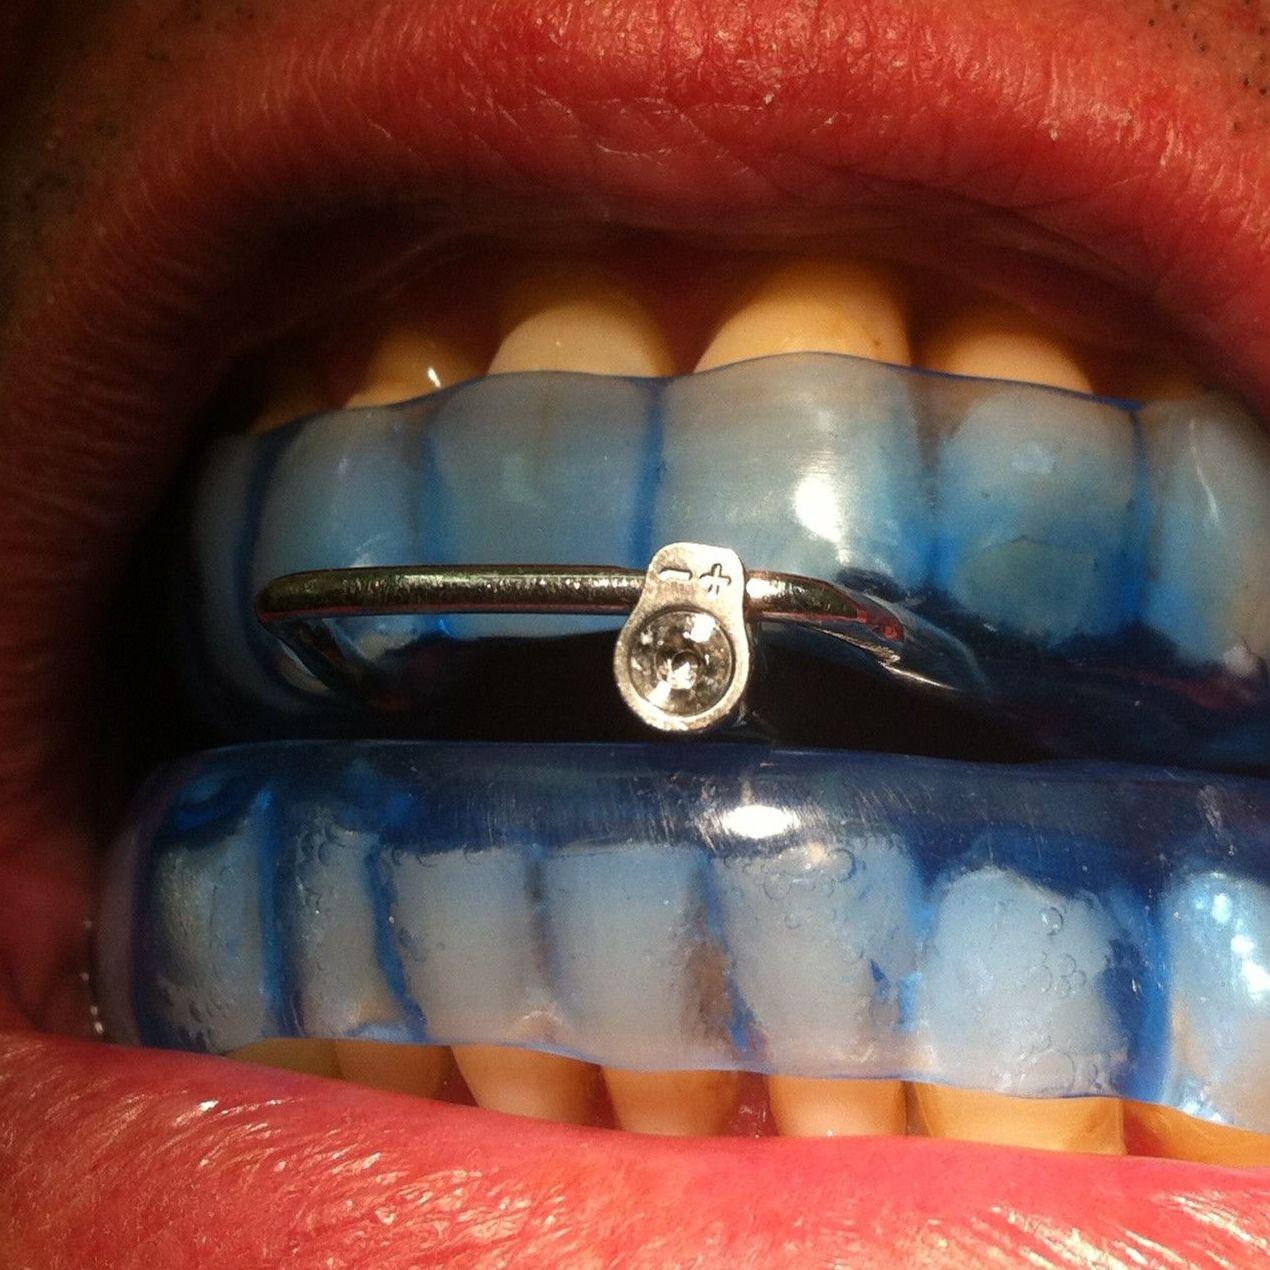 dispositivo de avance mandibular,D.A.M,apnea del sueño,antirronquidos,